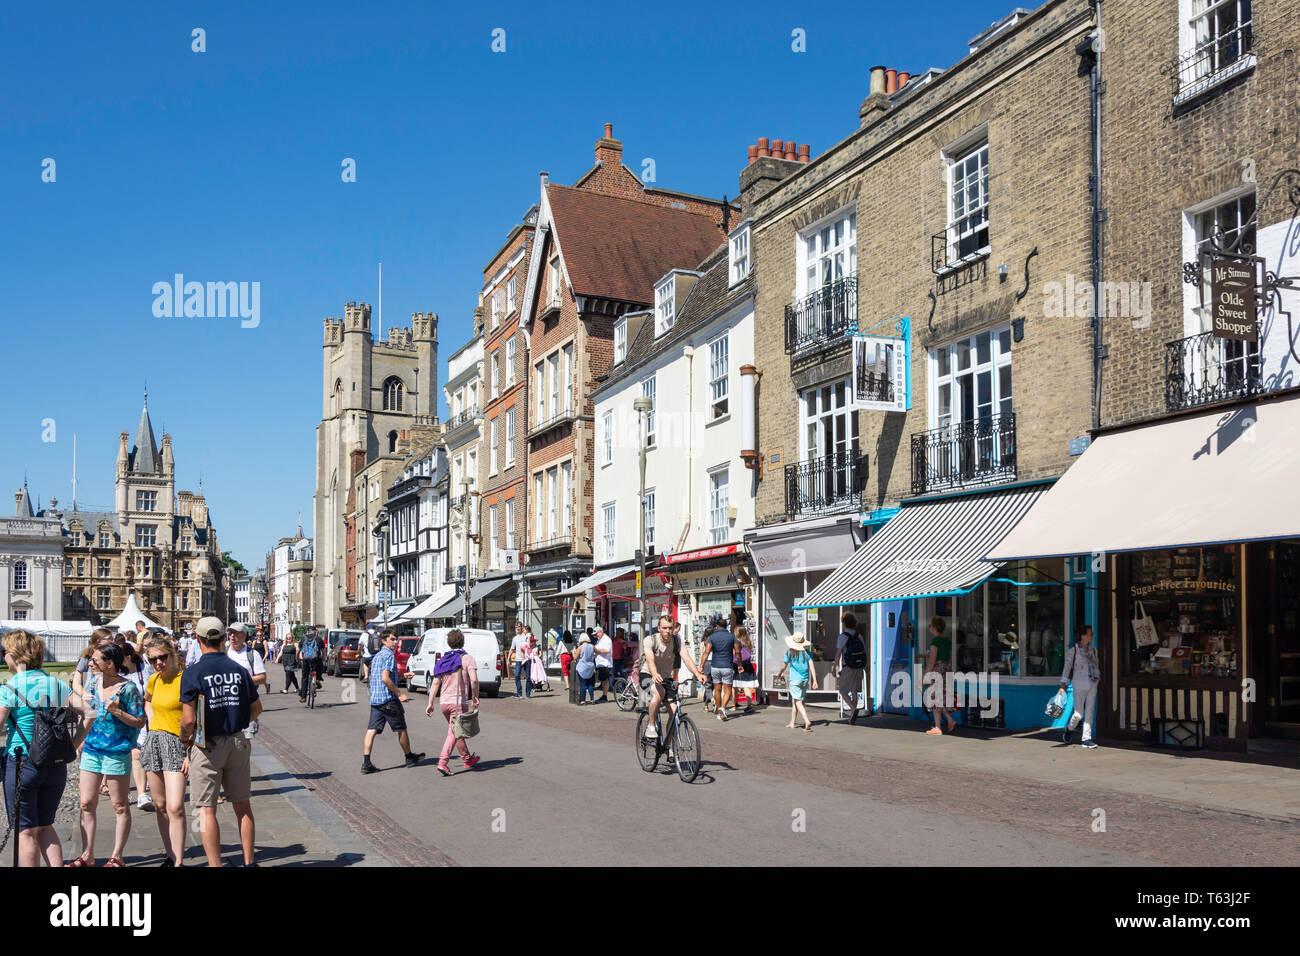 King's Parade showing Great St Mary's Church, Cambridge, Cambridgeshire, England, United Kingdom - Stock Image